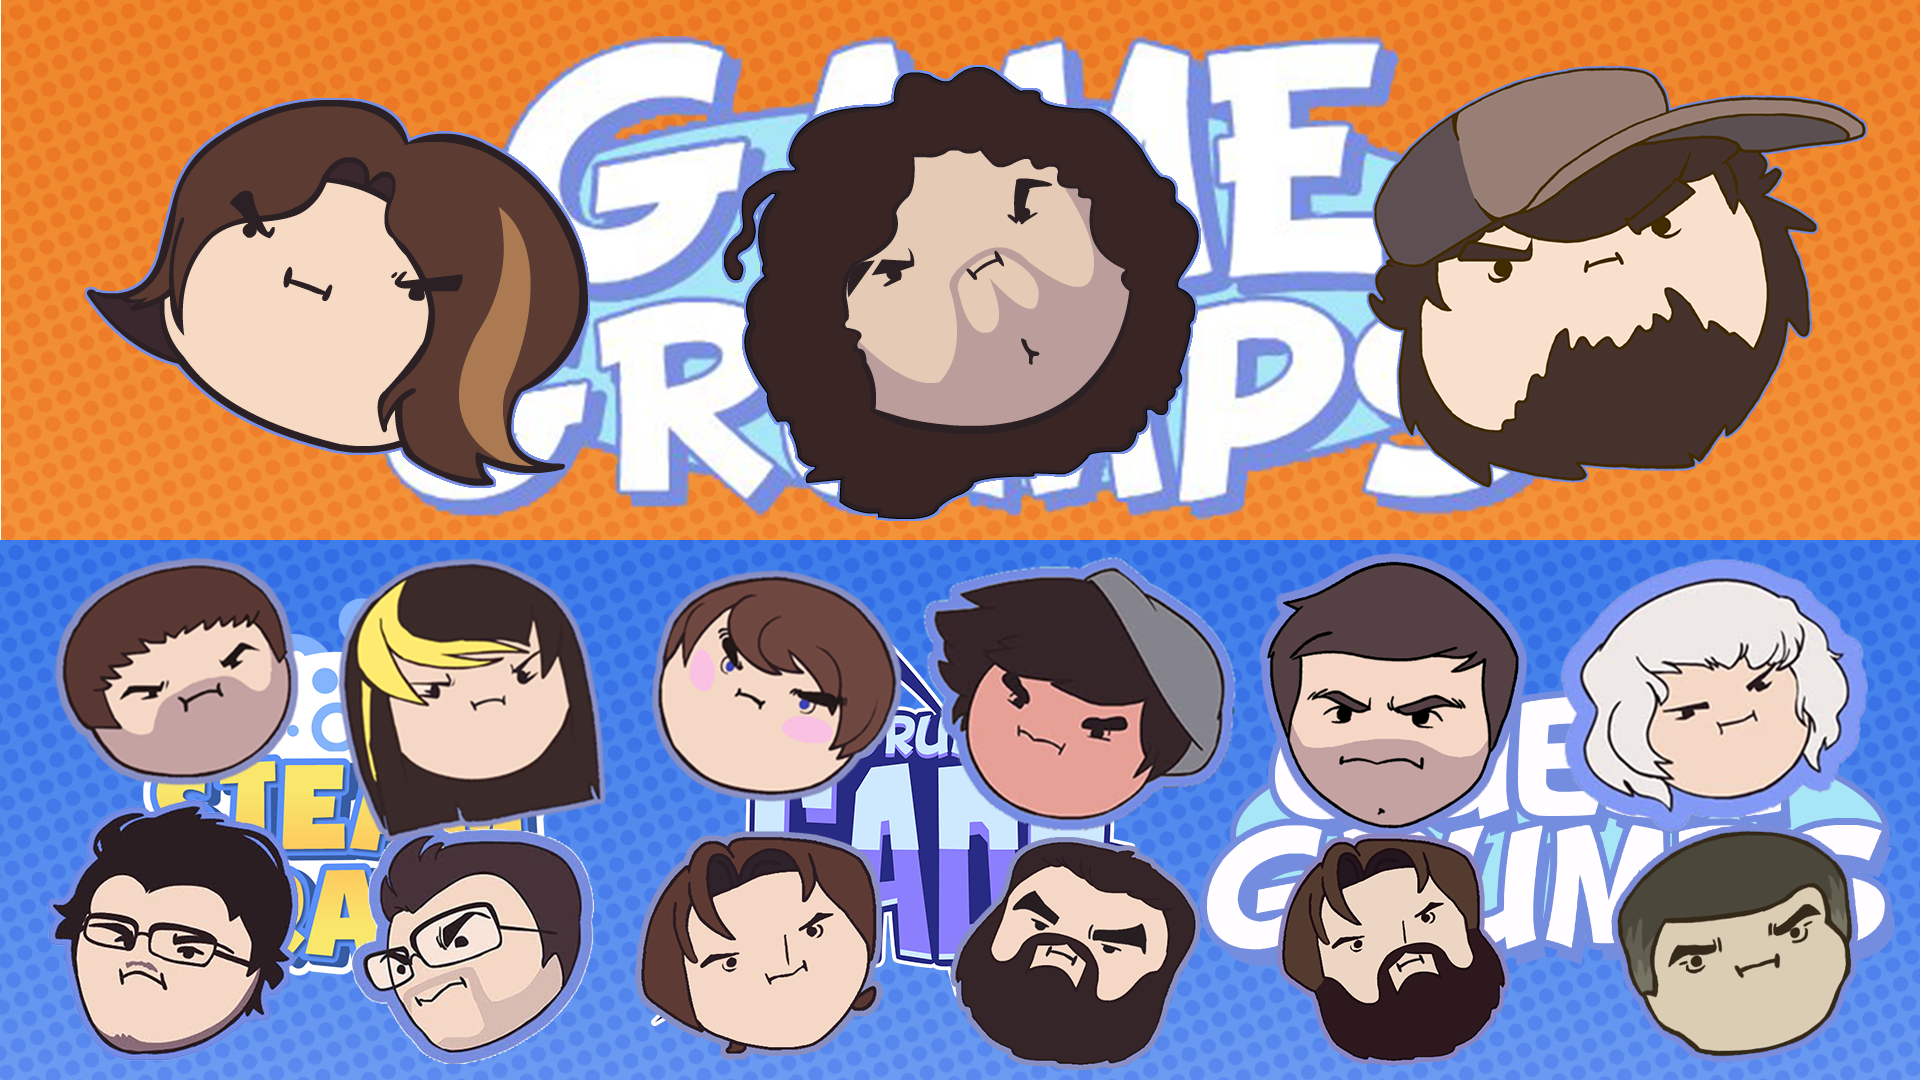 New GameGrumps Desktop Background by AlexTehKidd